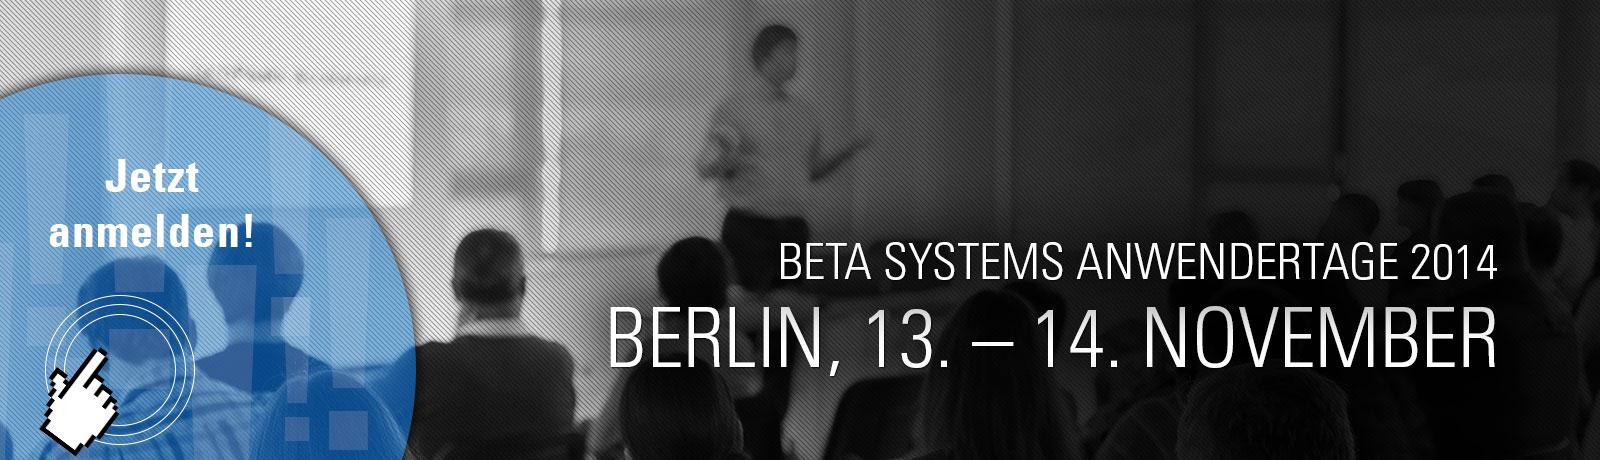 Beta Systems Anwendertage 2014